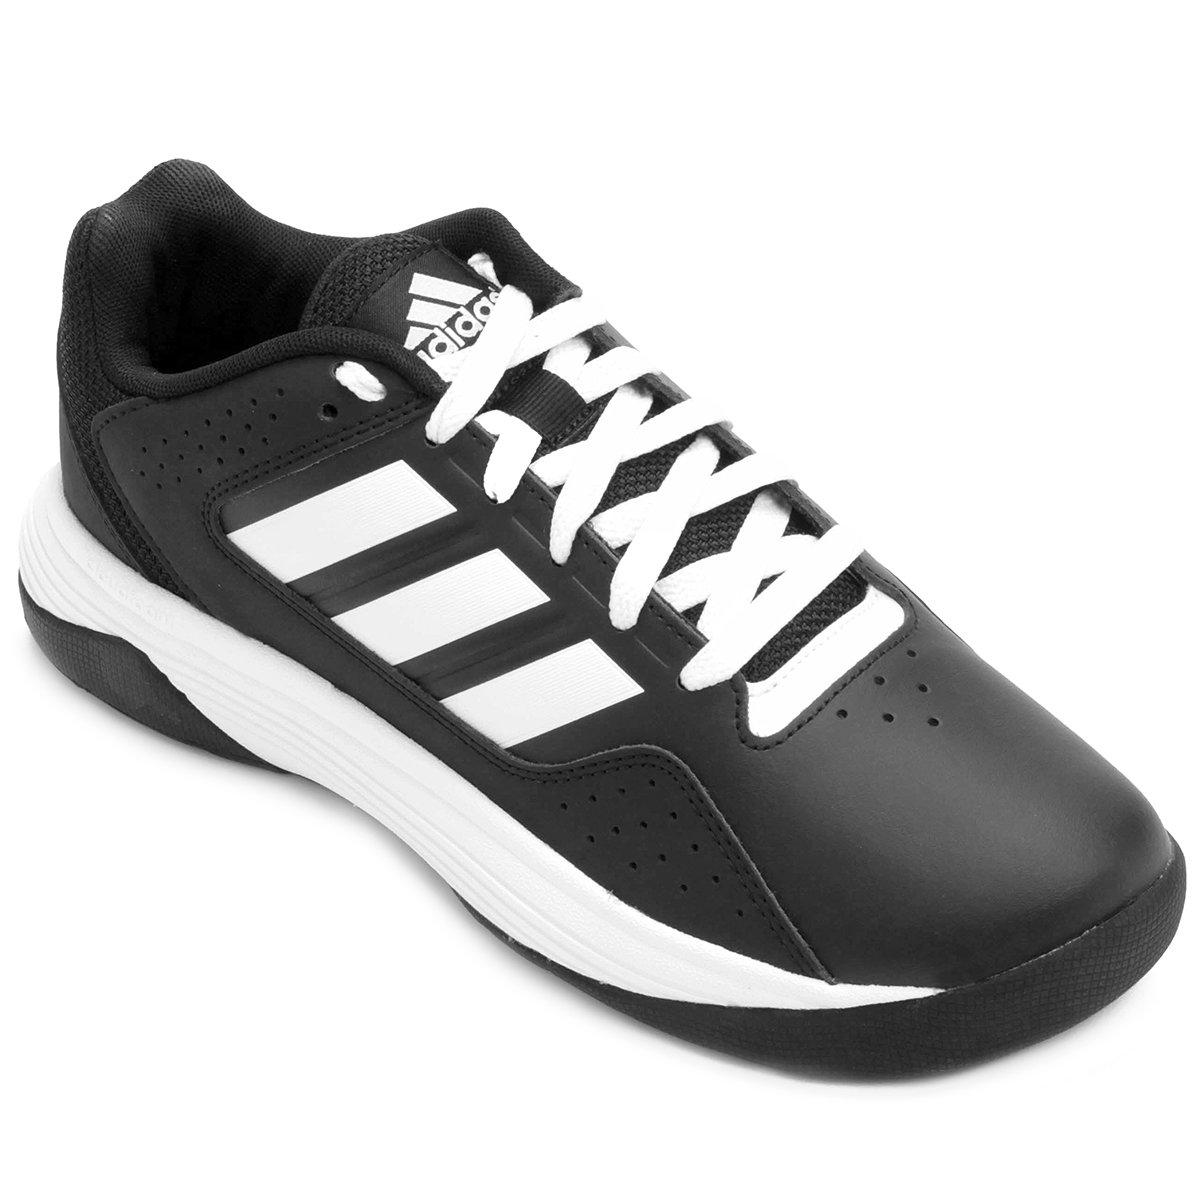 3e6d15ee3d1 Tênis Adidas Cloudfoam Ilation - Compre Agora